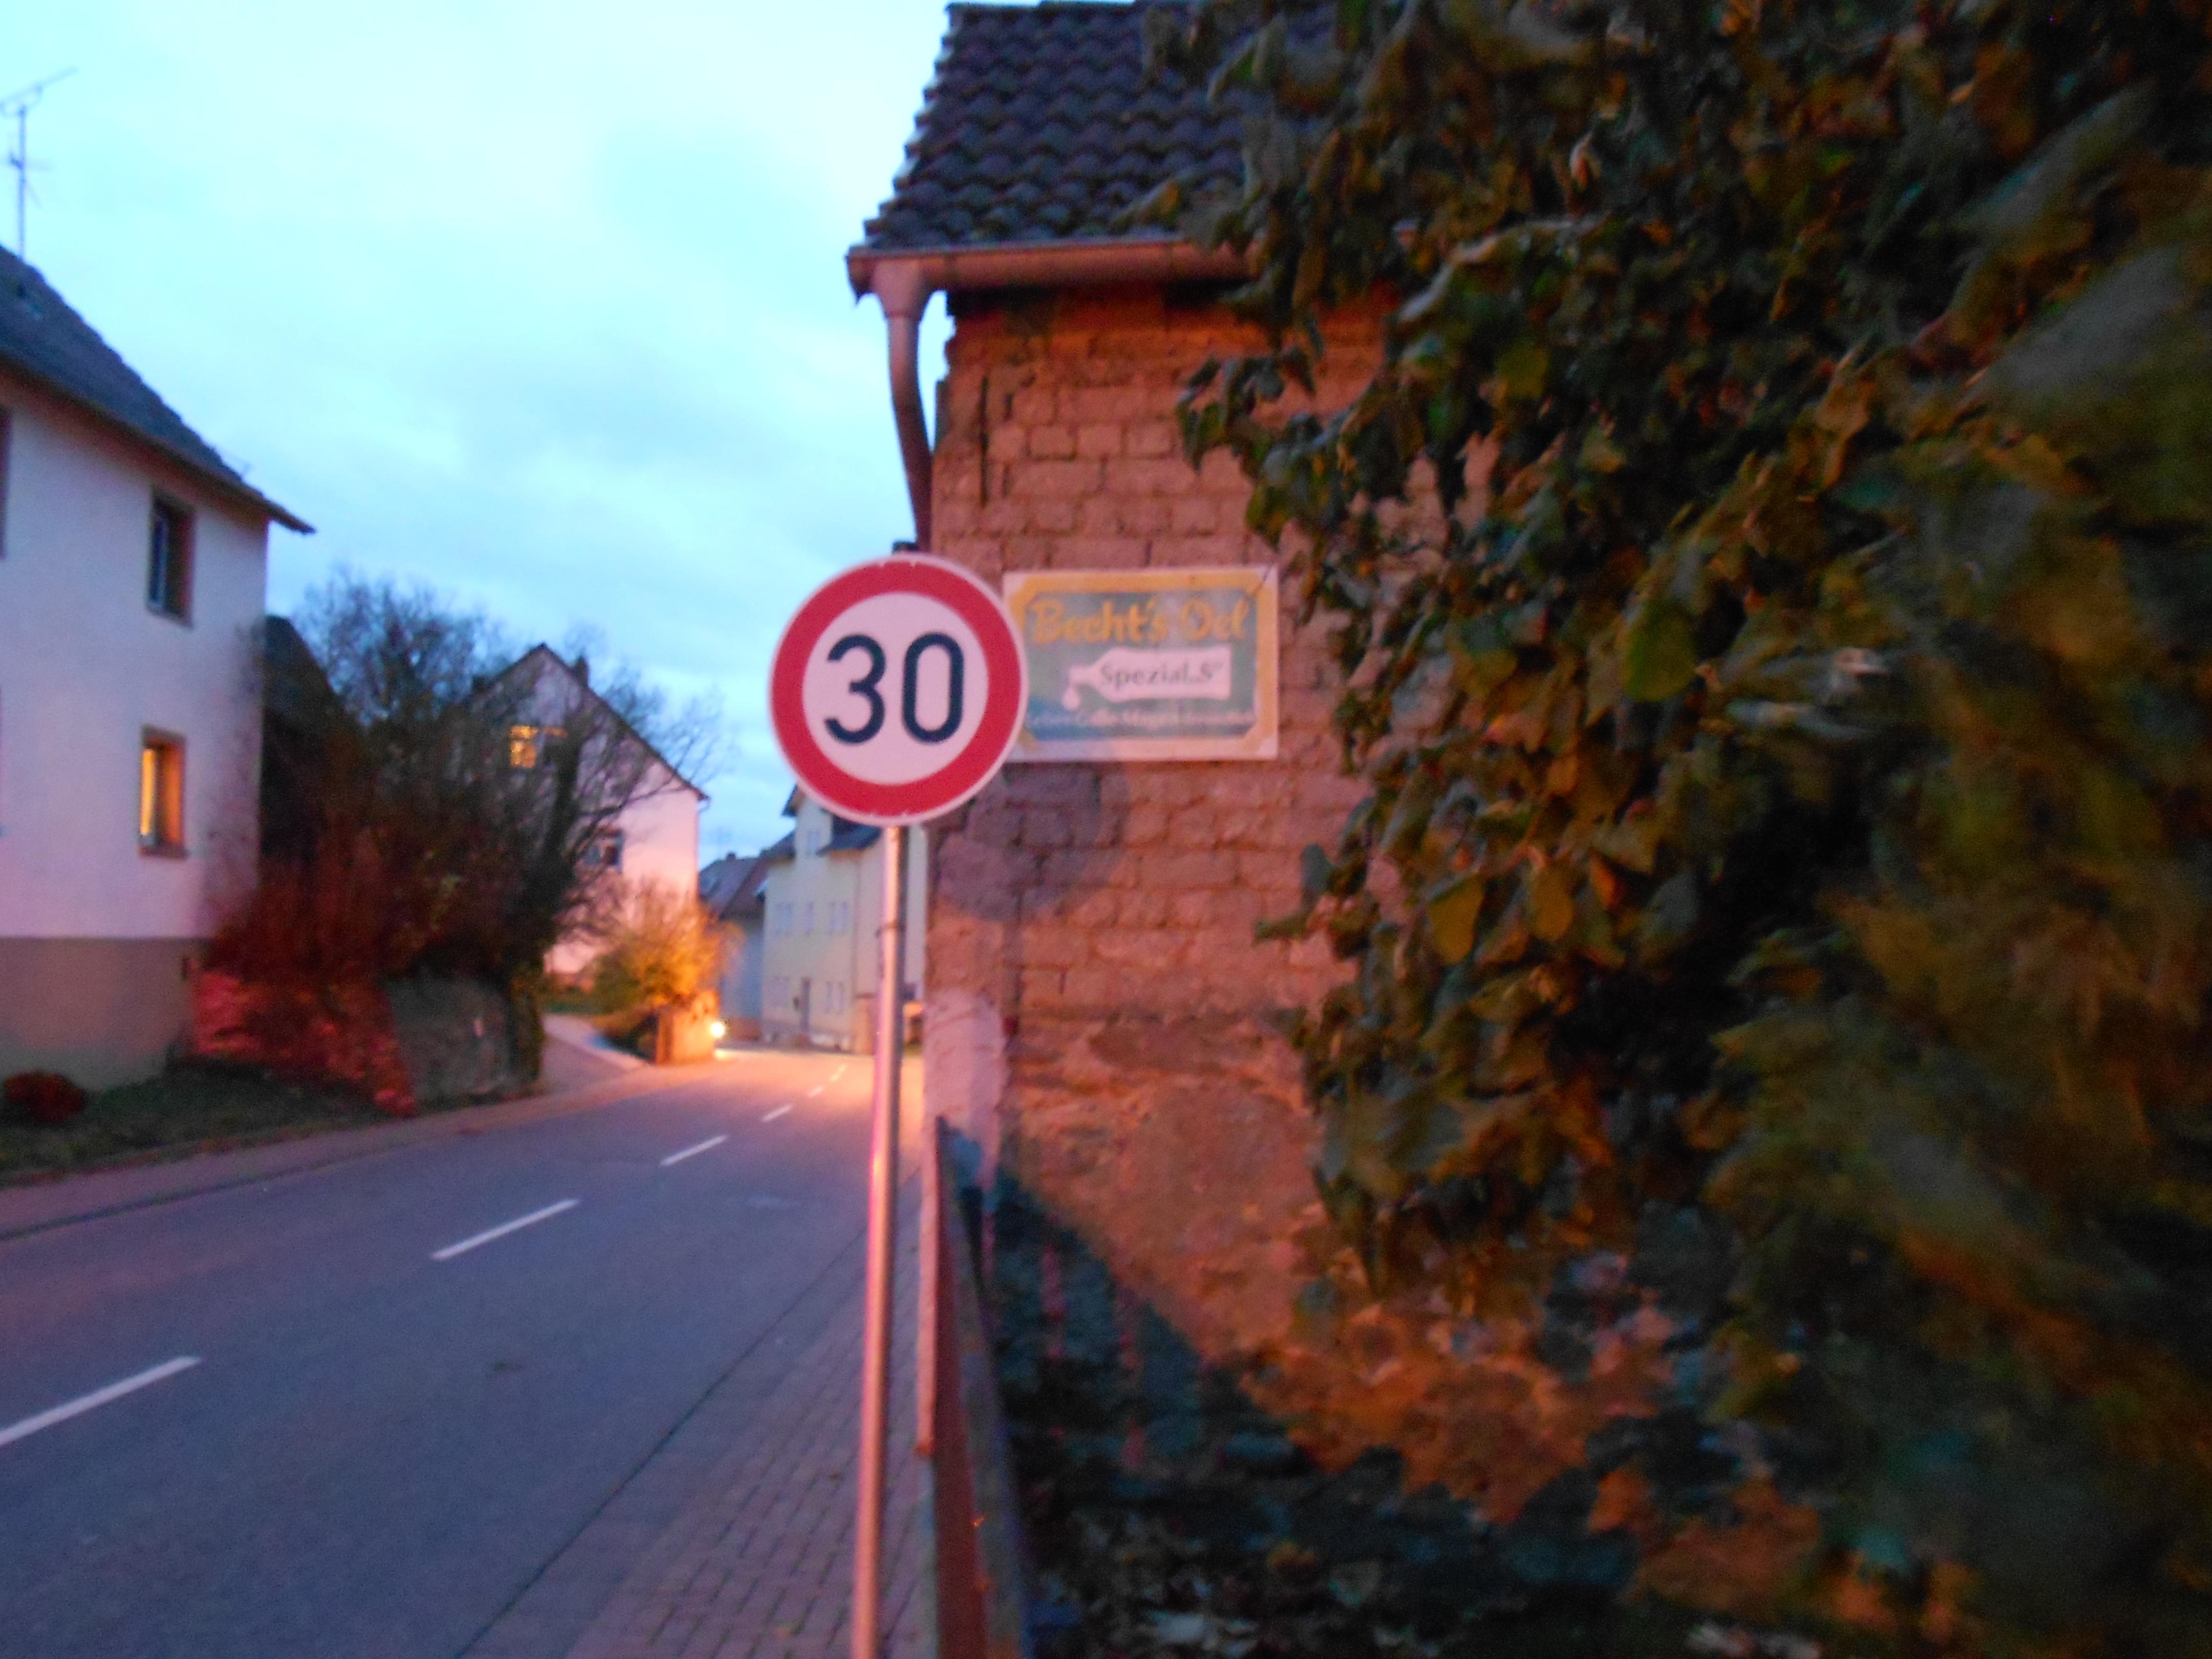 #76 Kubach-Weilburg, Hauptstrasse K411